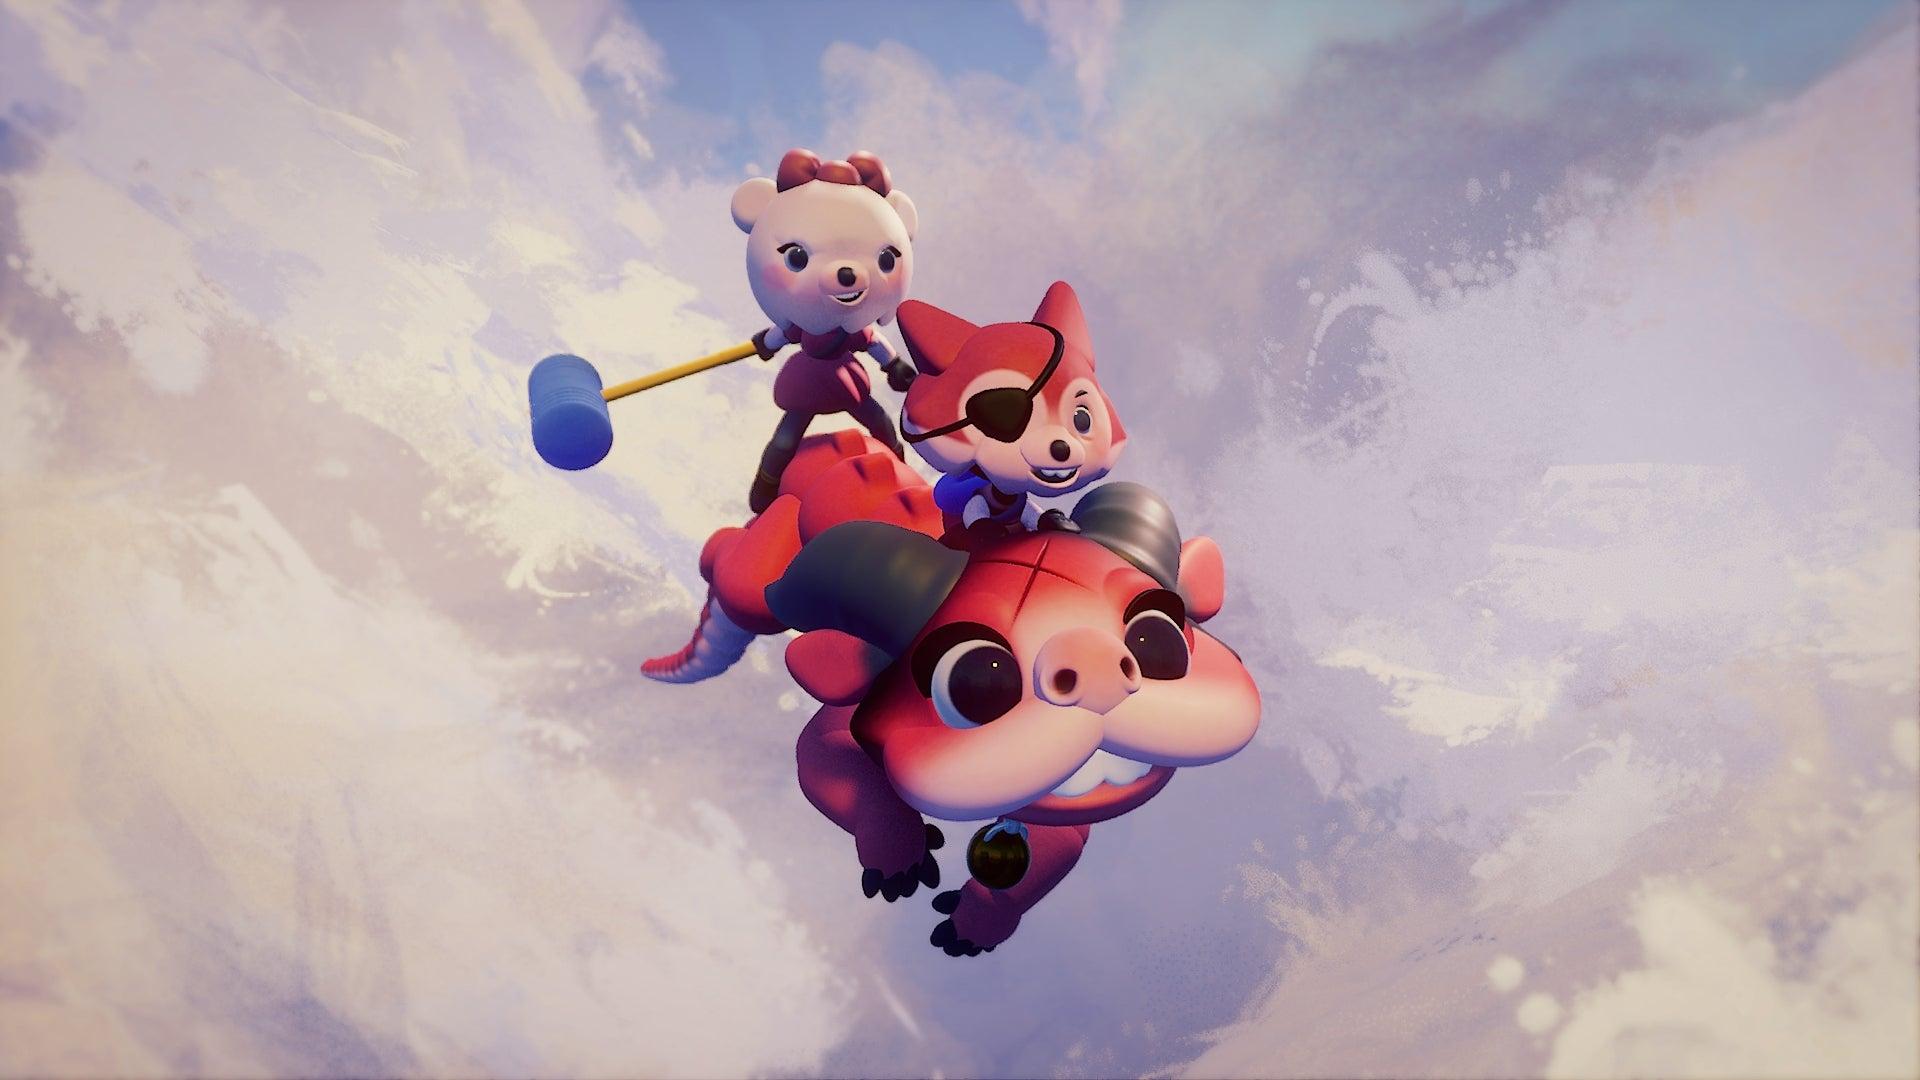 Image for Media Molecule is hiring dev teams to create games in Dreams